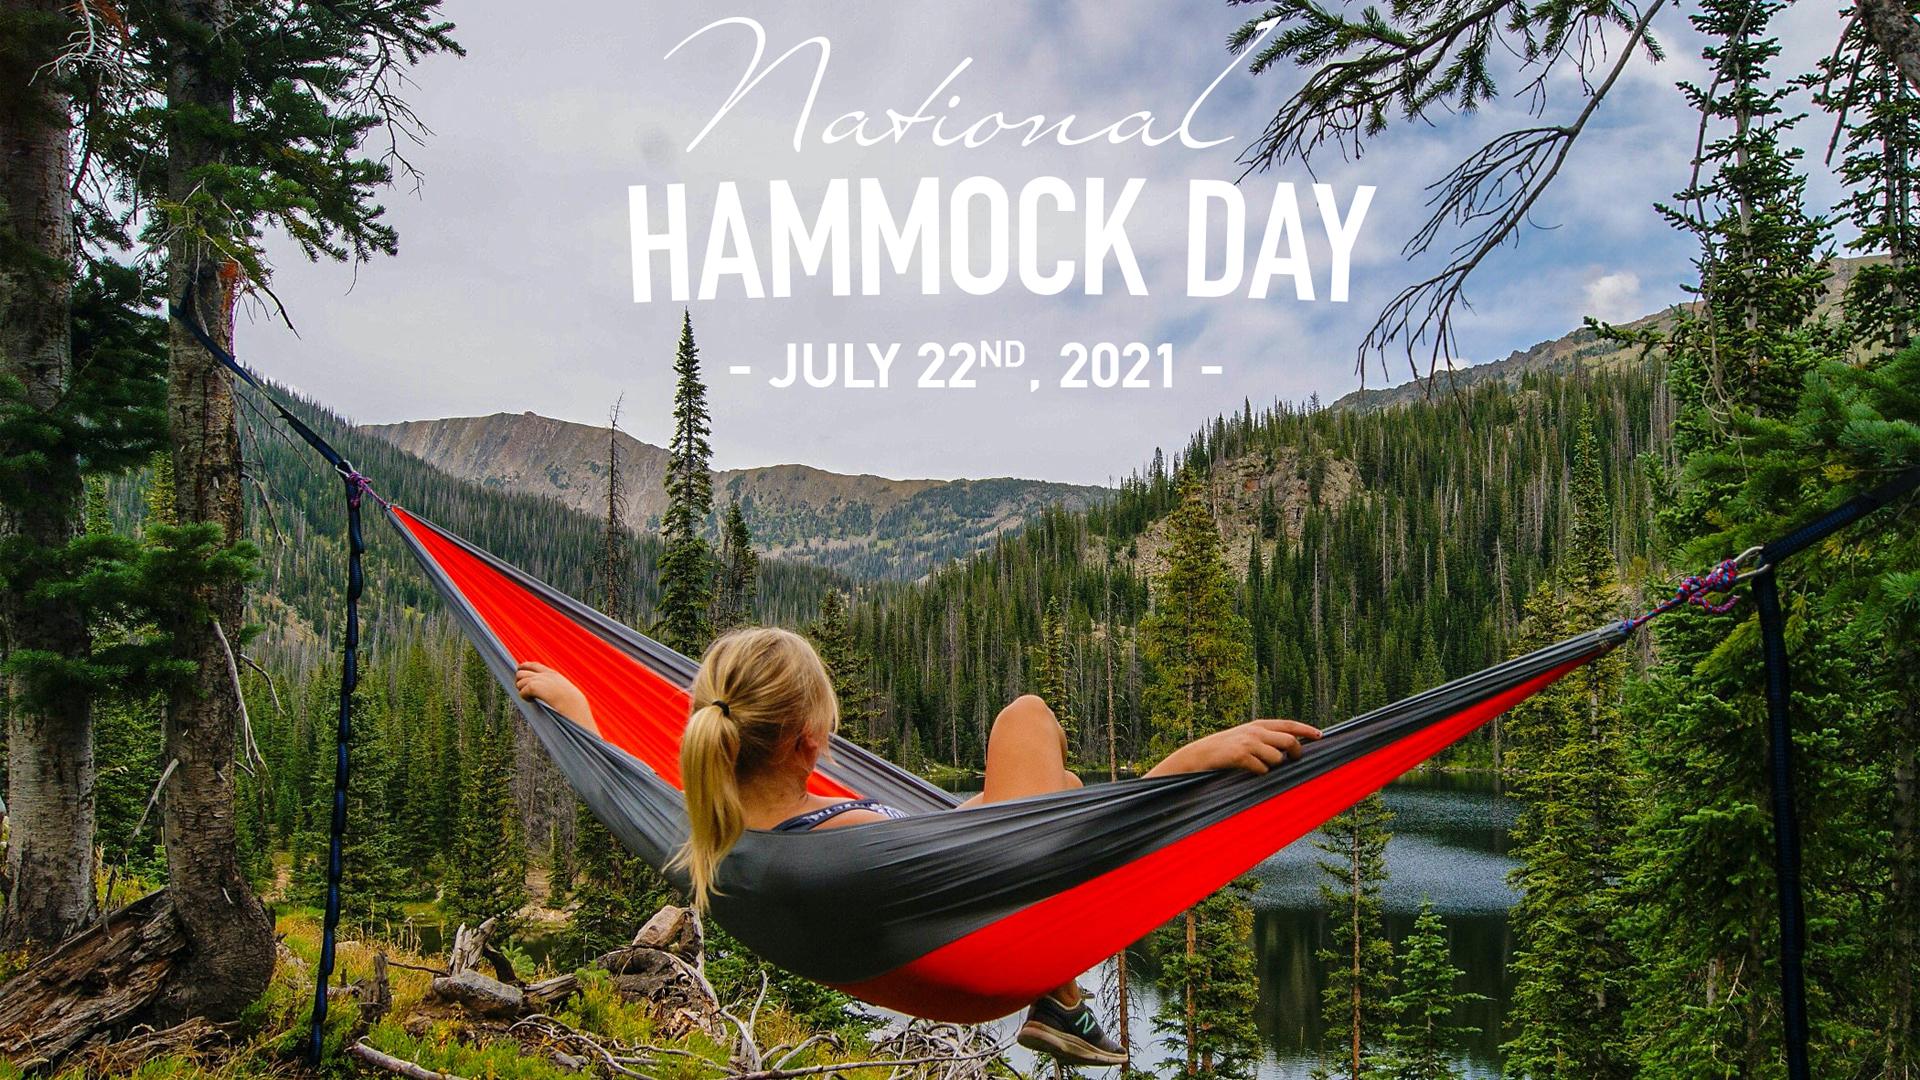 Nation Hammock Day July 22 Digital Signage Graphic